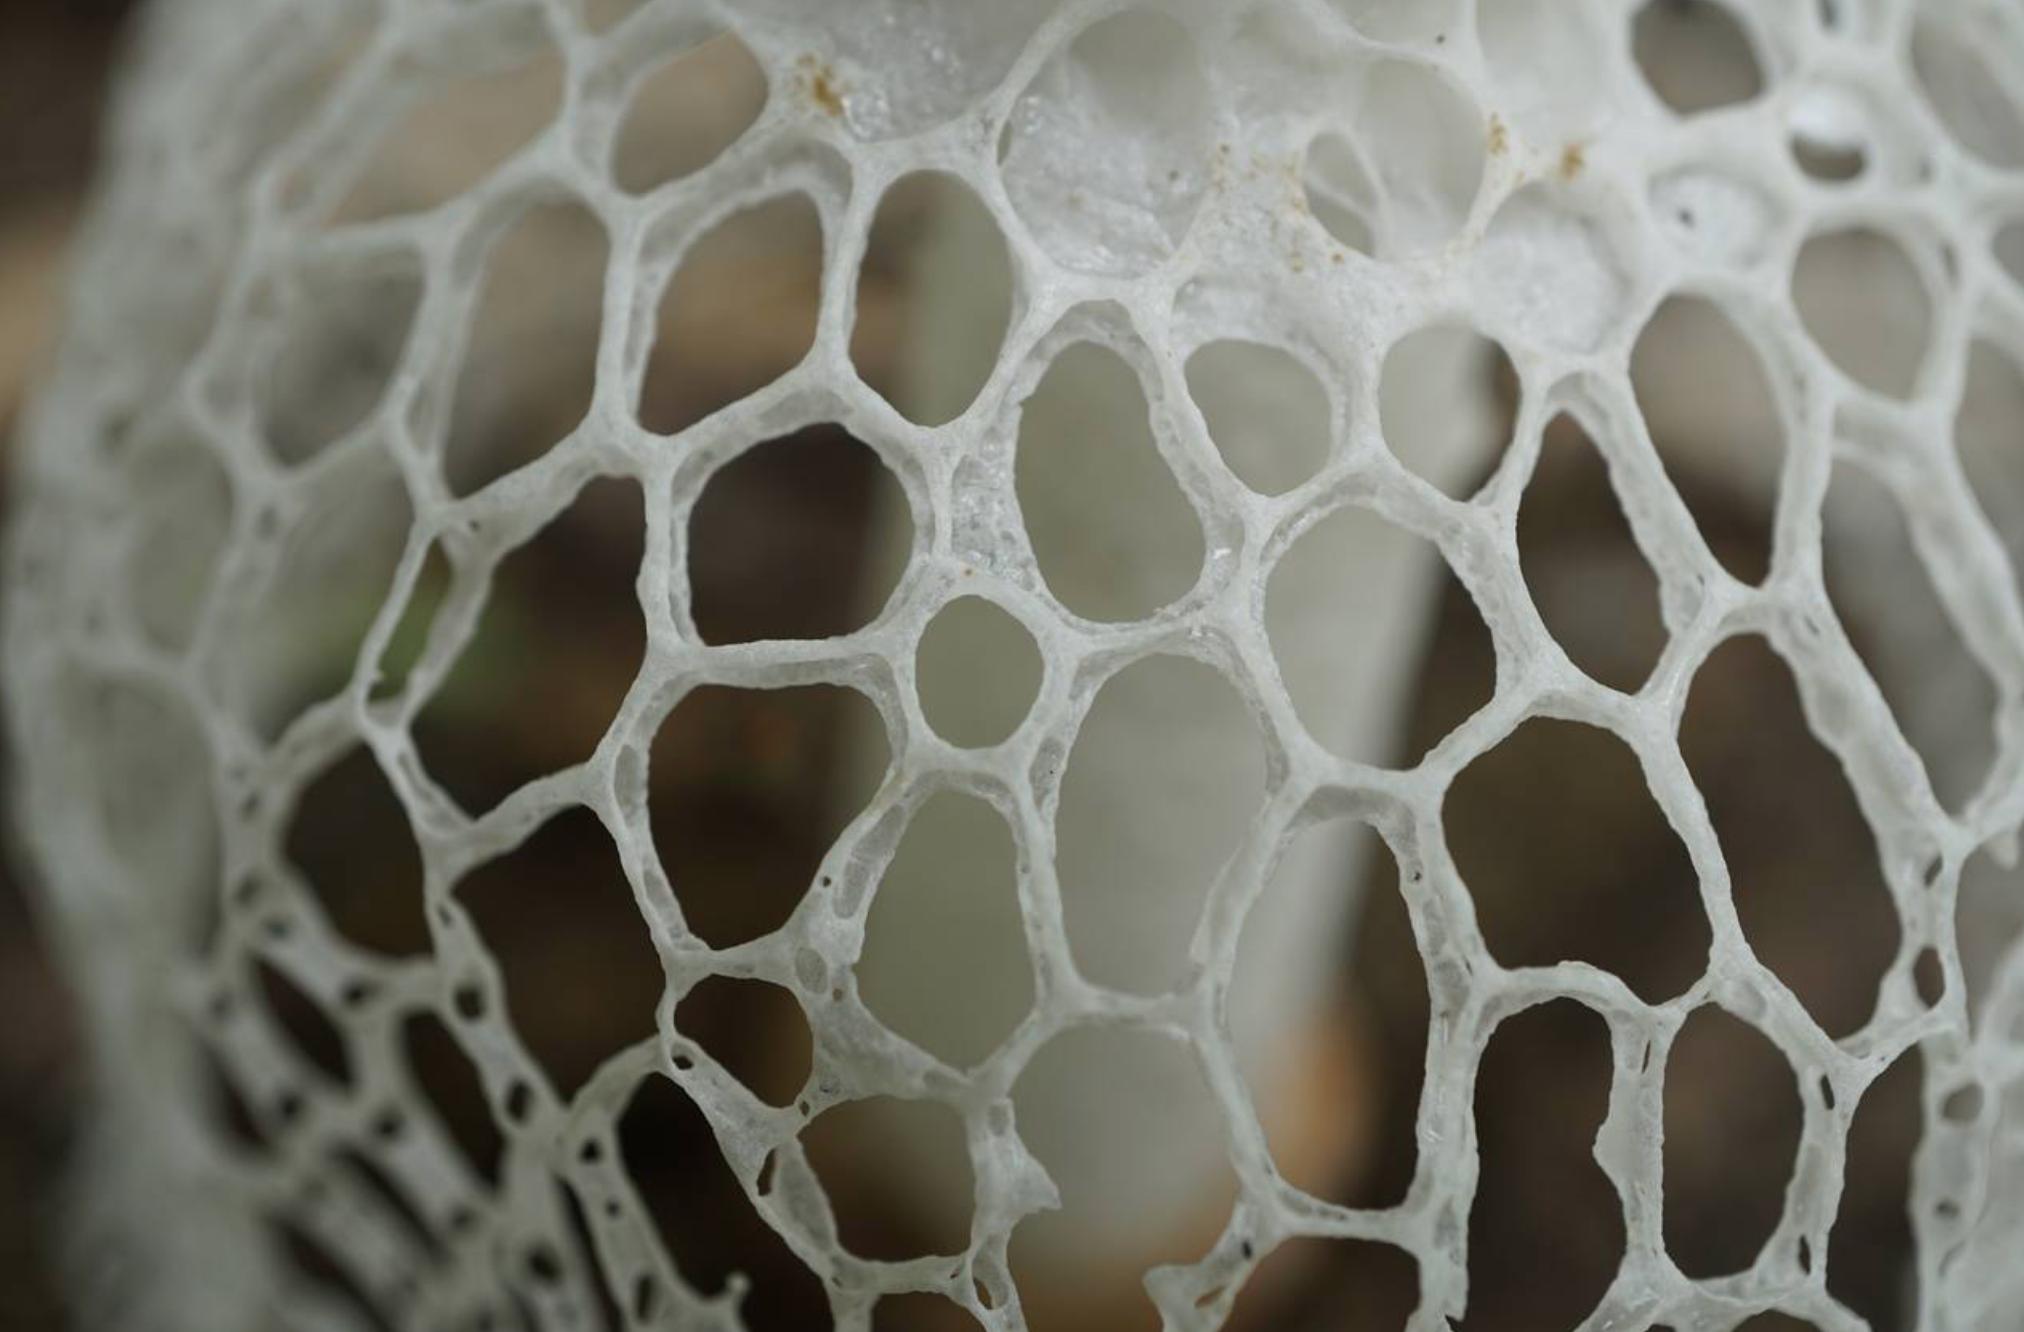 The net-like veil up close. Photo by  Alison Harrington .